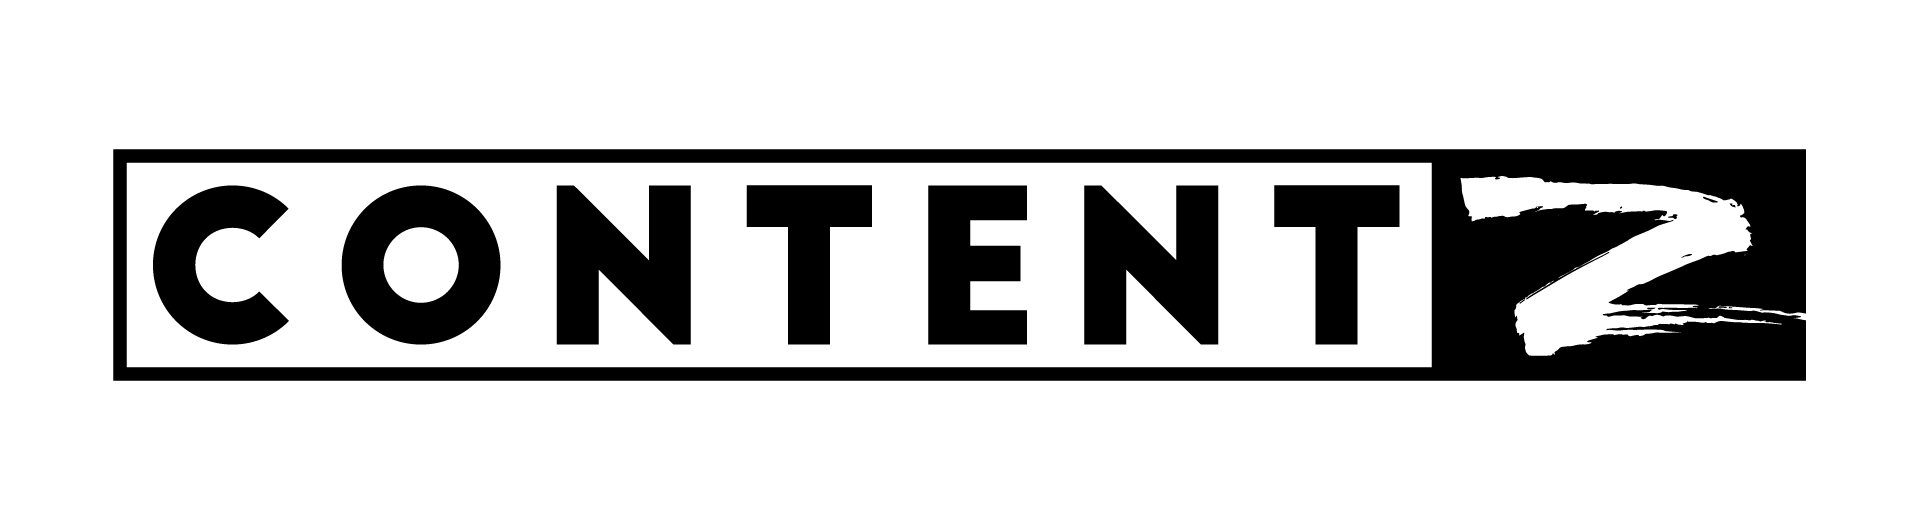 ContentZ_logo.png